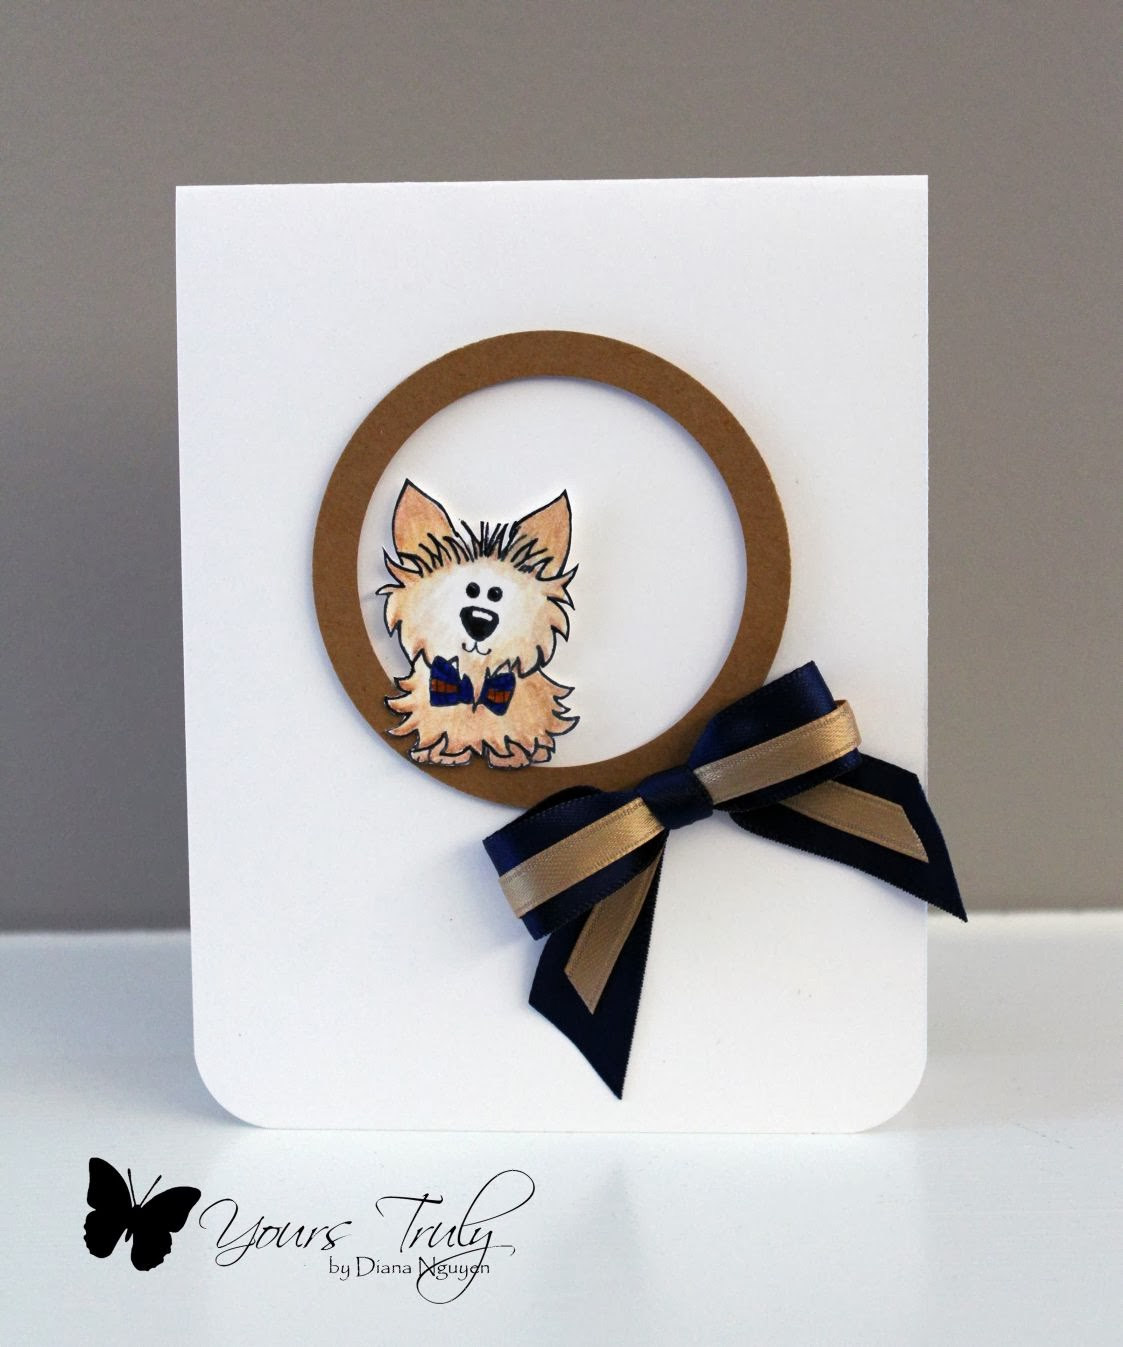 Diana Nguyen, puppy, handmade card